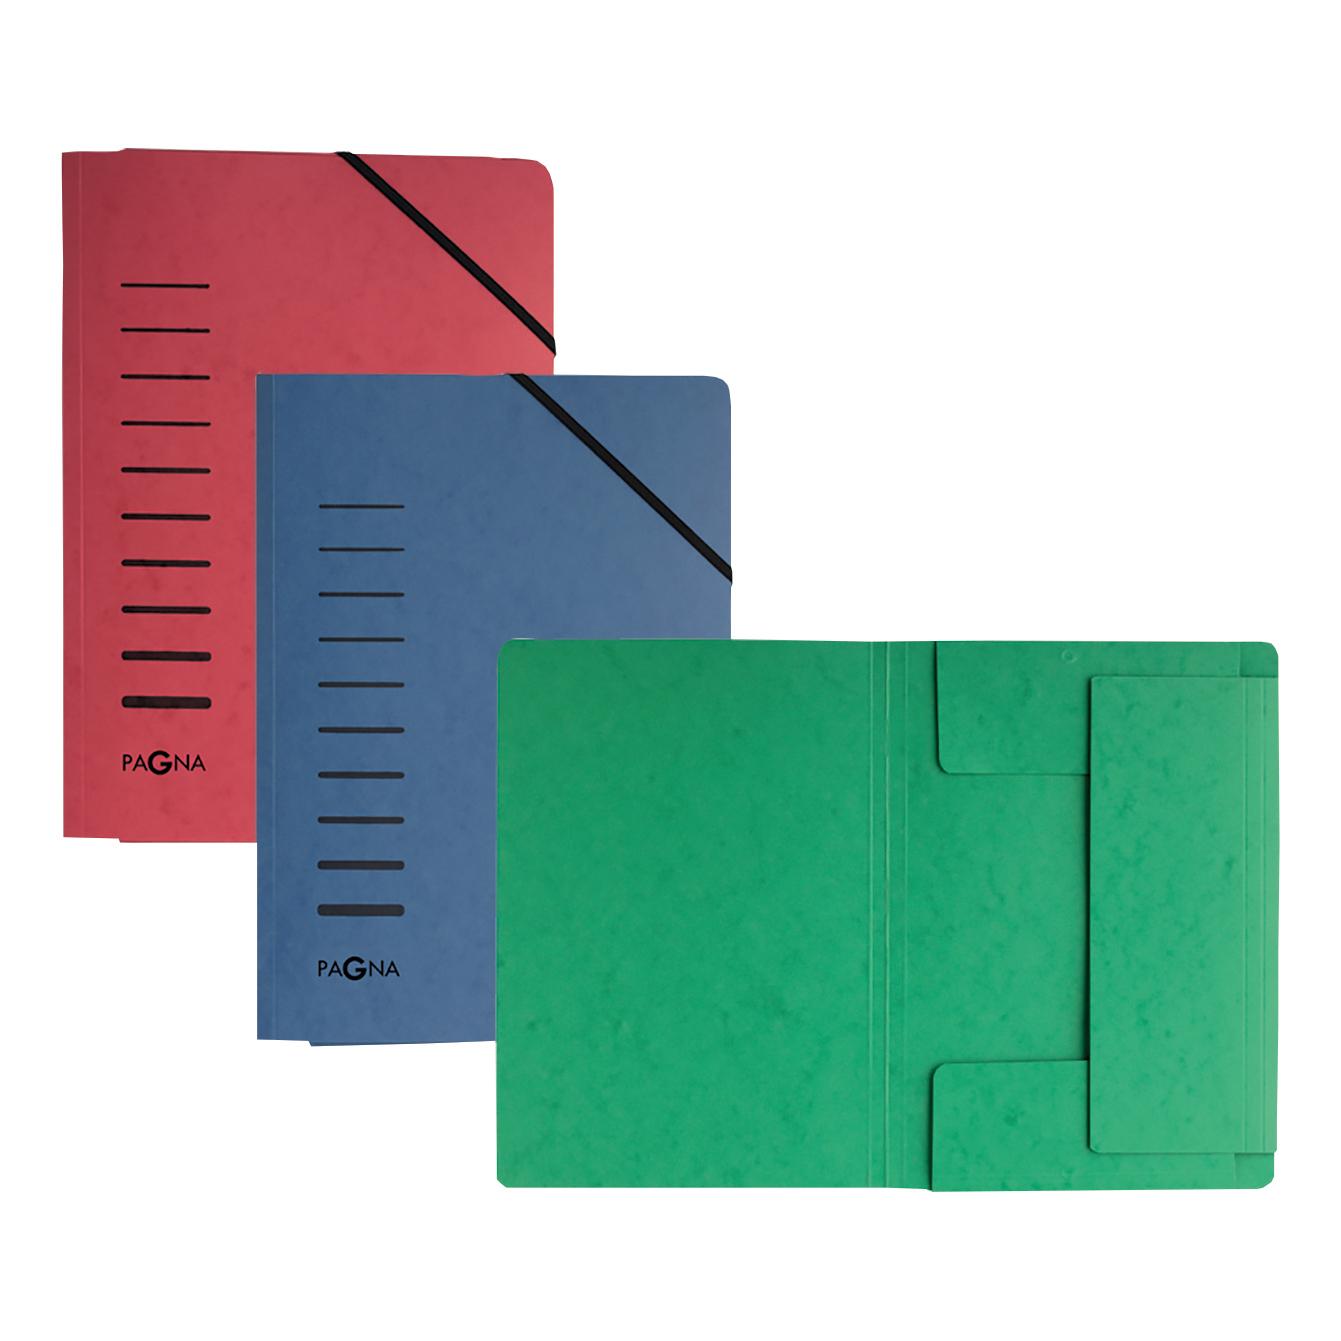 Pagna Classic Folder Elastic Corner Straps Pressboard A4 Green Ref 2400703 Pack 25